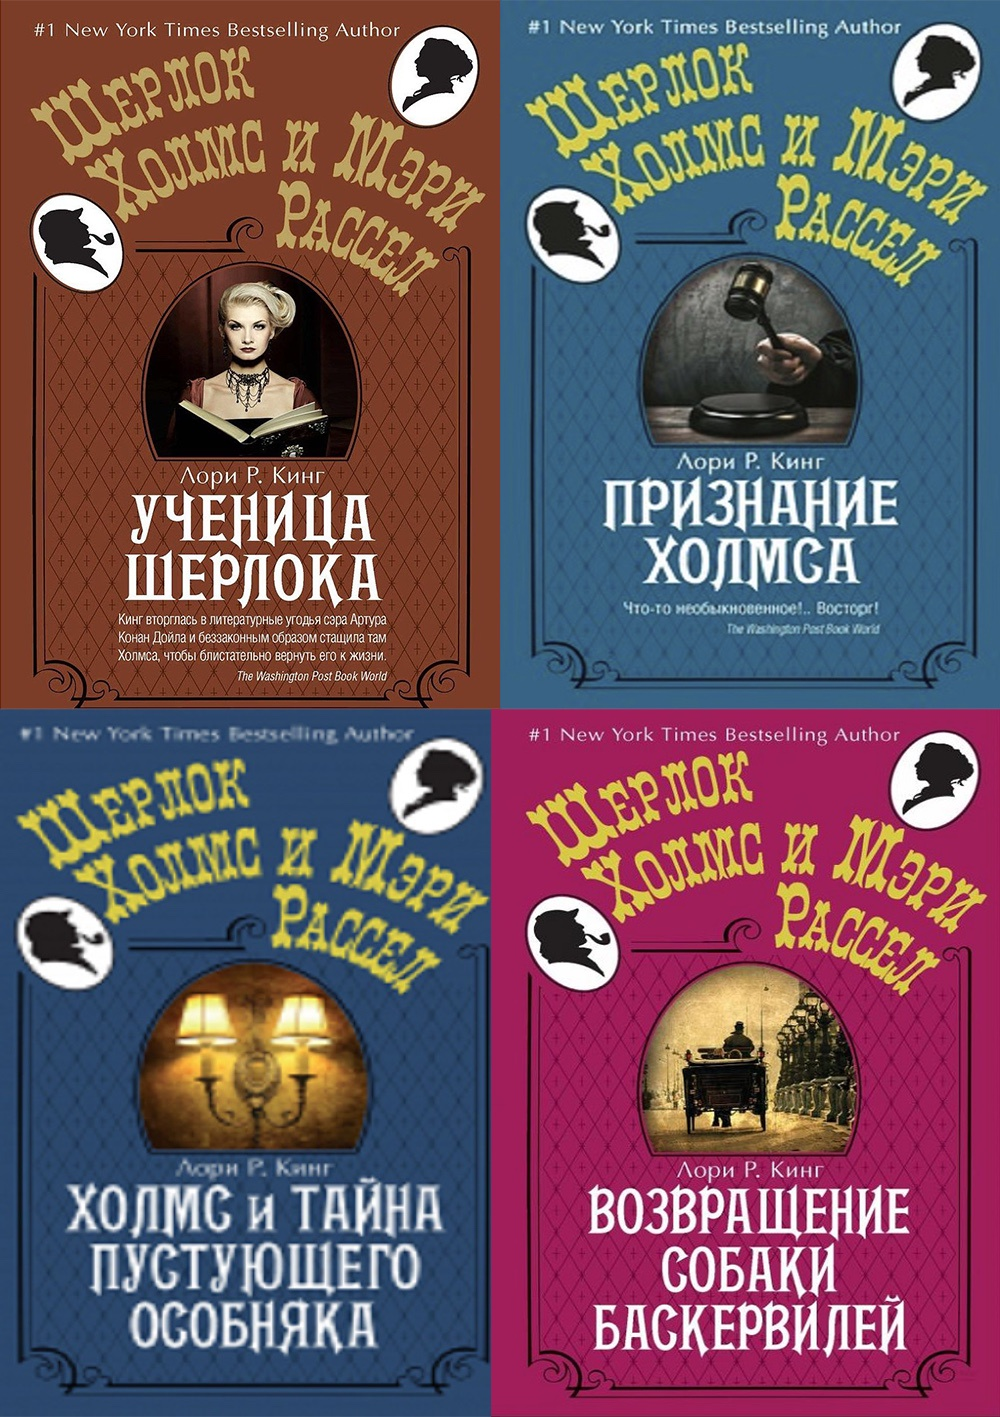 "Лори Р. Кинг Набор детективных историй ""Шерлок Холмс"" 4 книги"